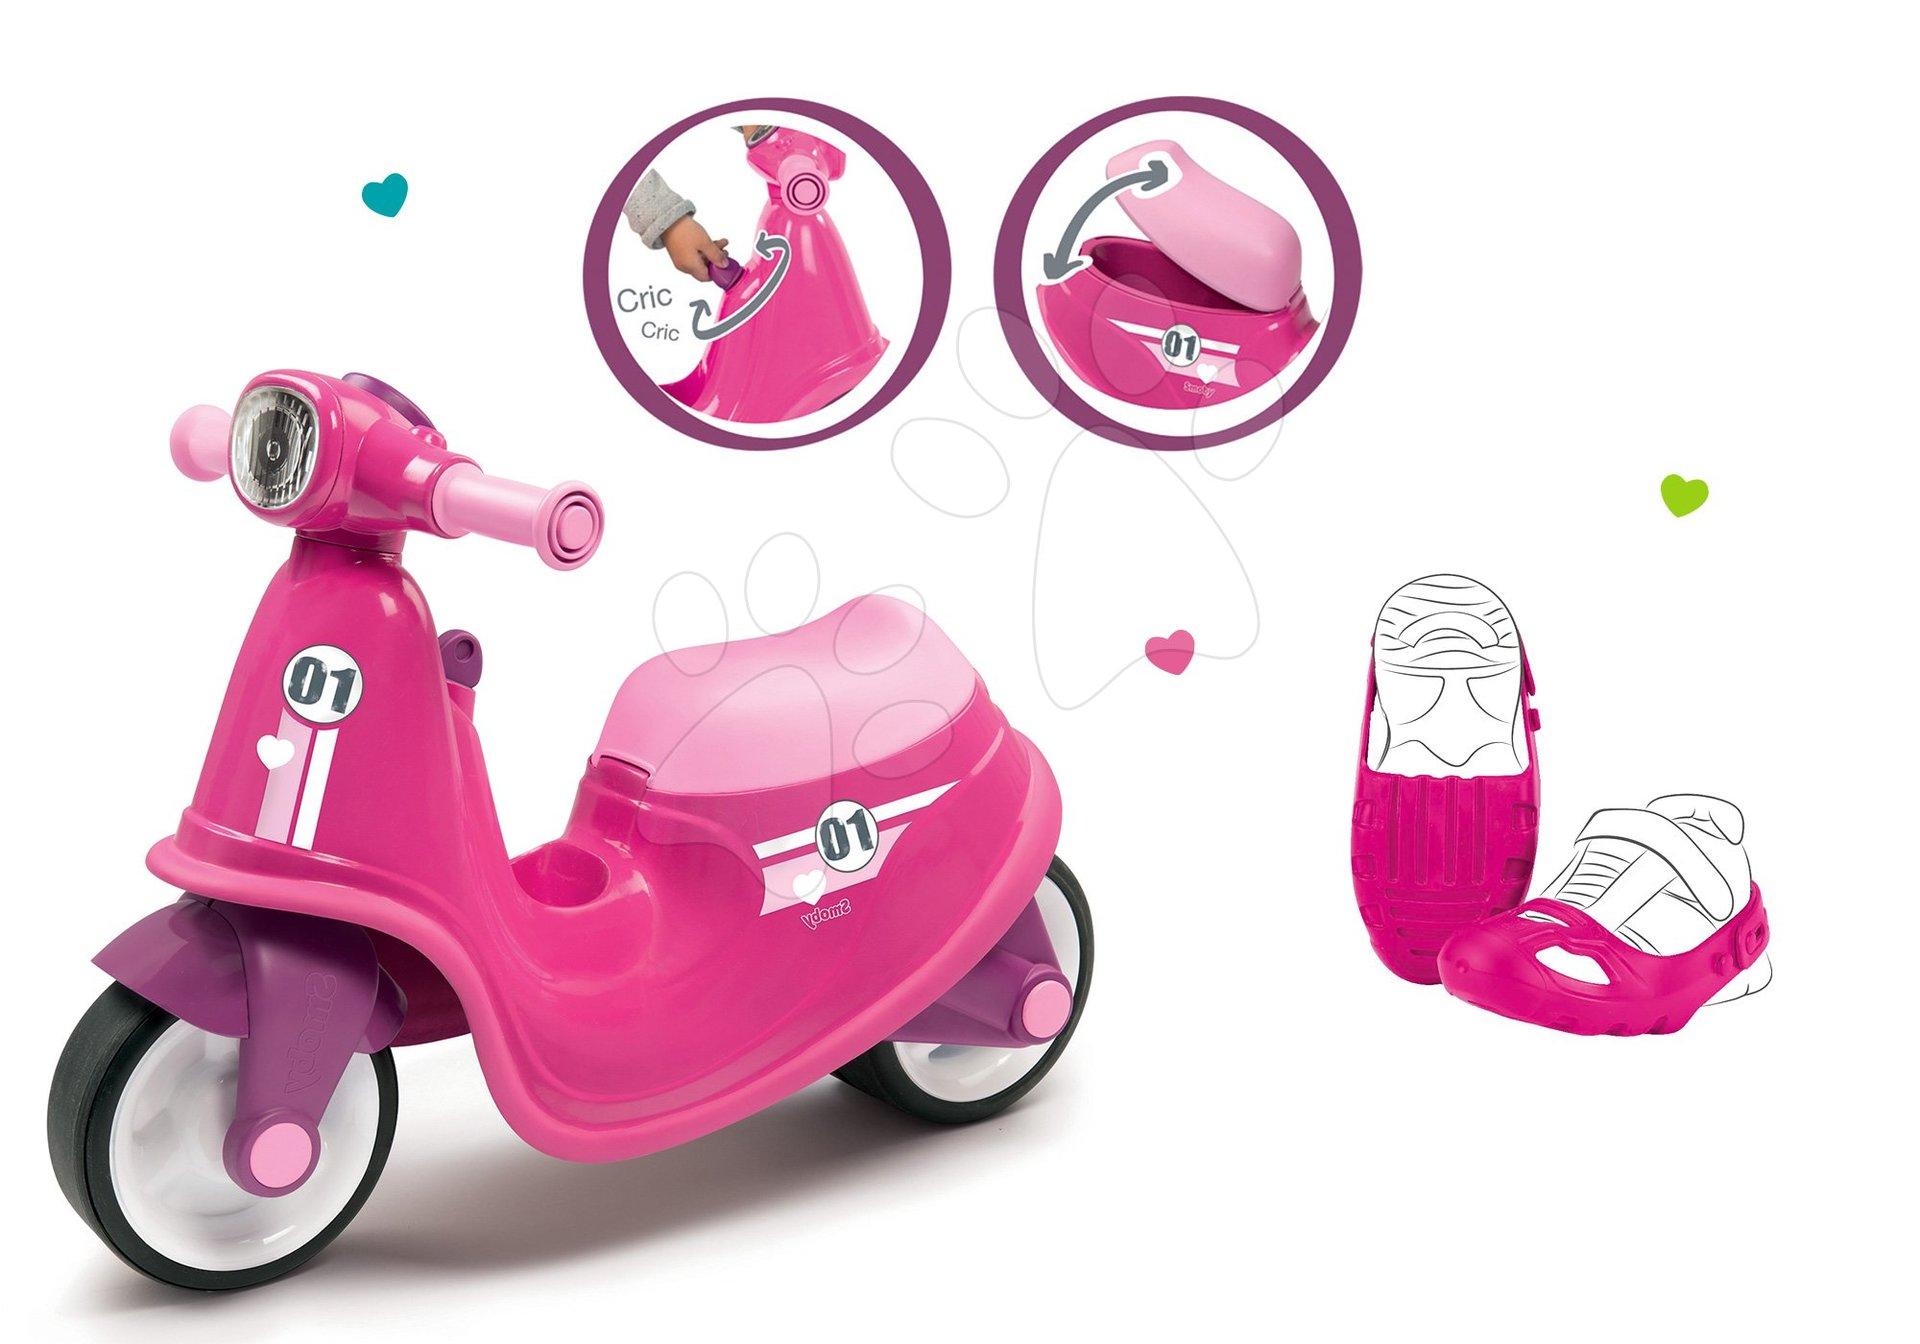 Smoby set odrážadlo Scooter Pink s gumenými kolesami a ochranné návleky na topánky ako darček 721002-6